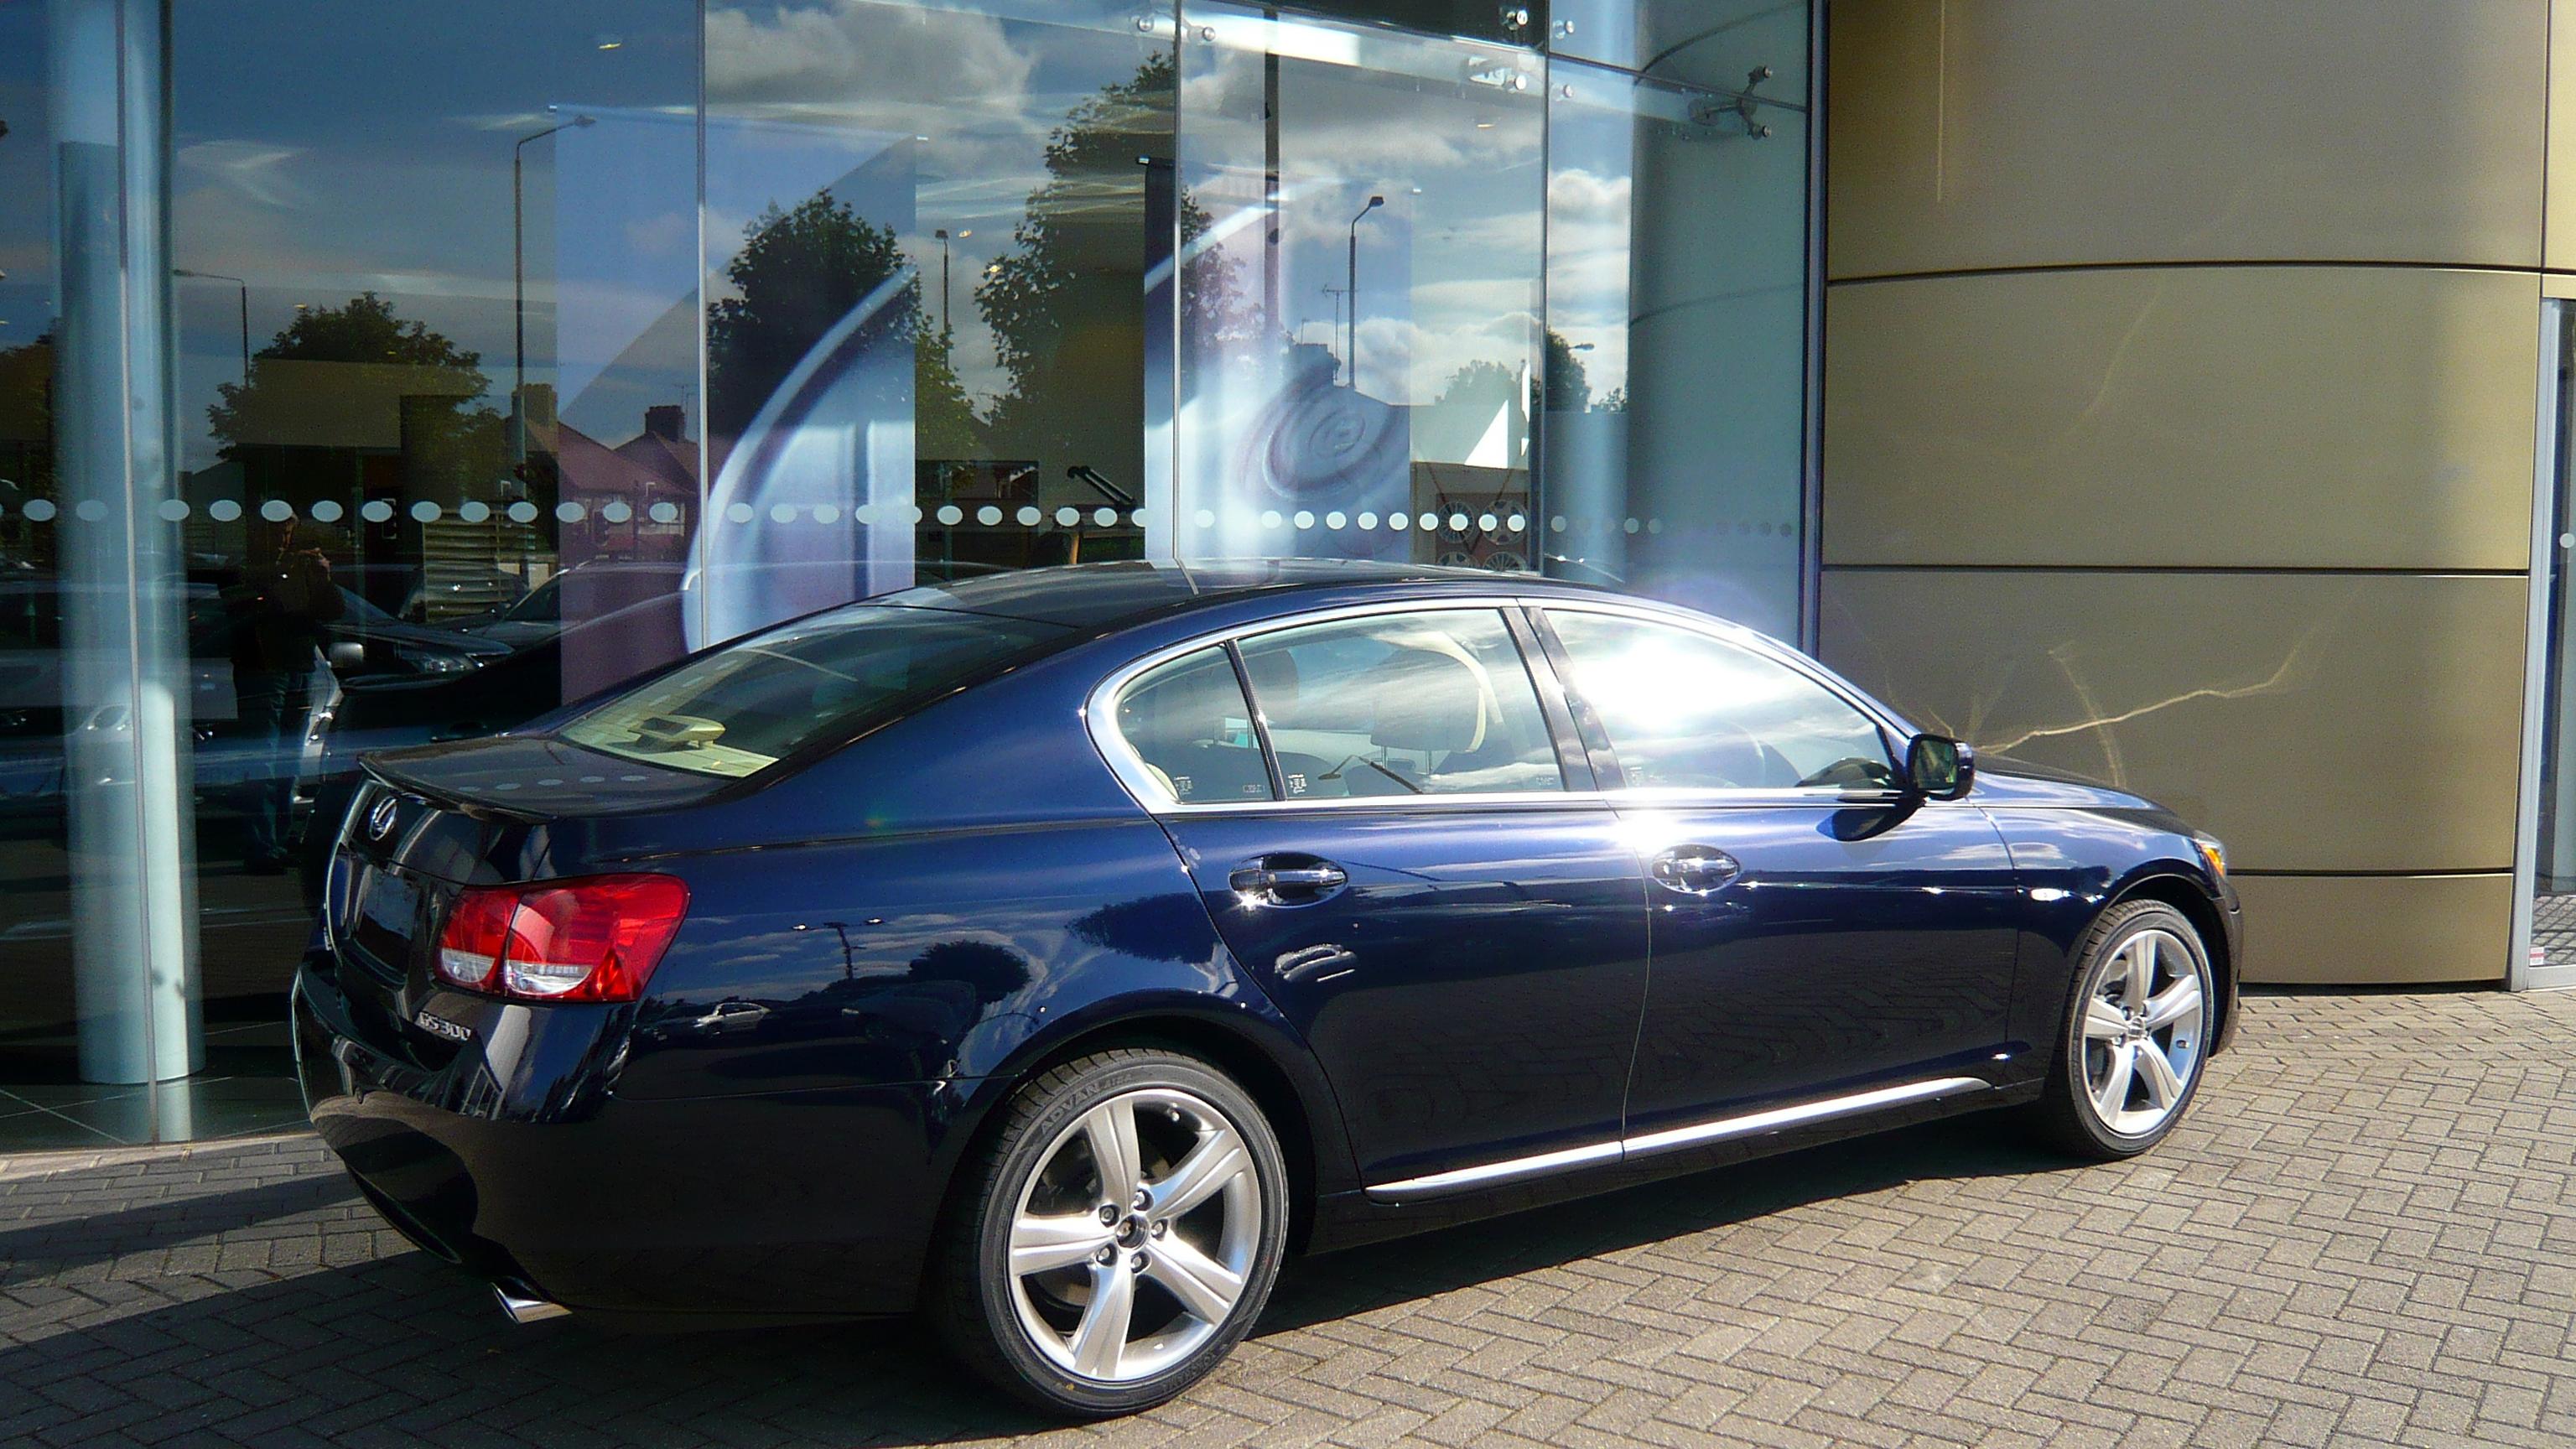 Black Sapphire Pearl Car Paint